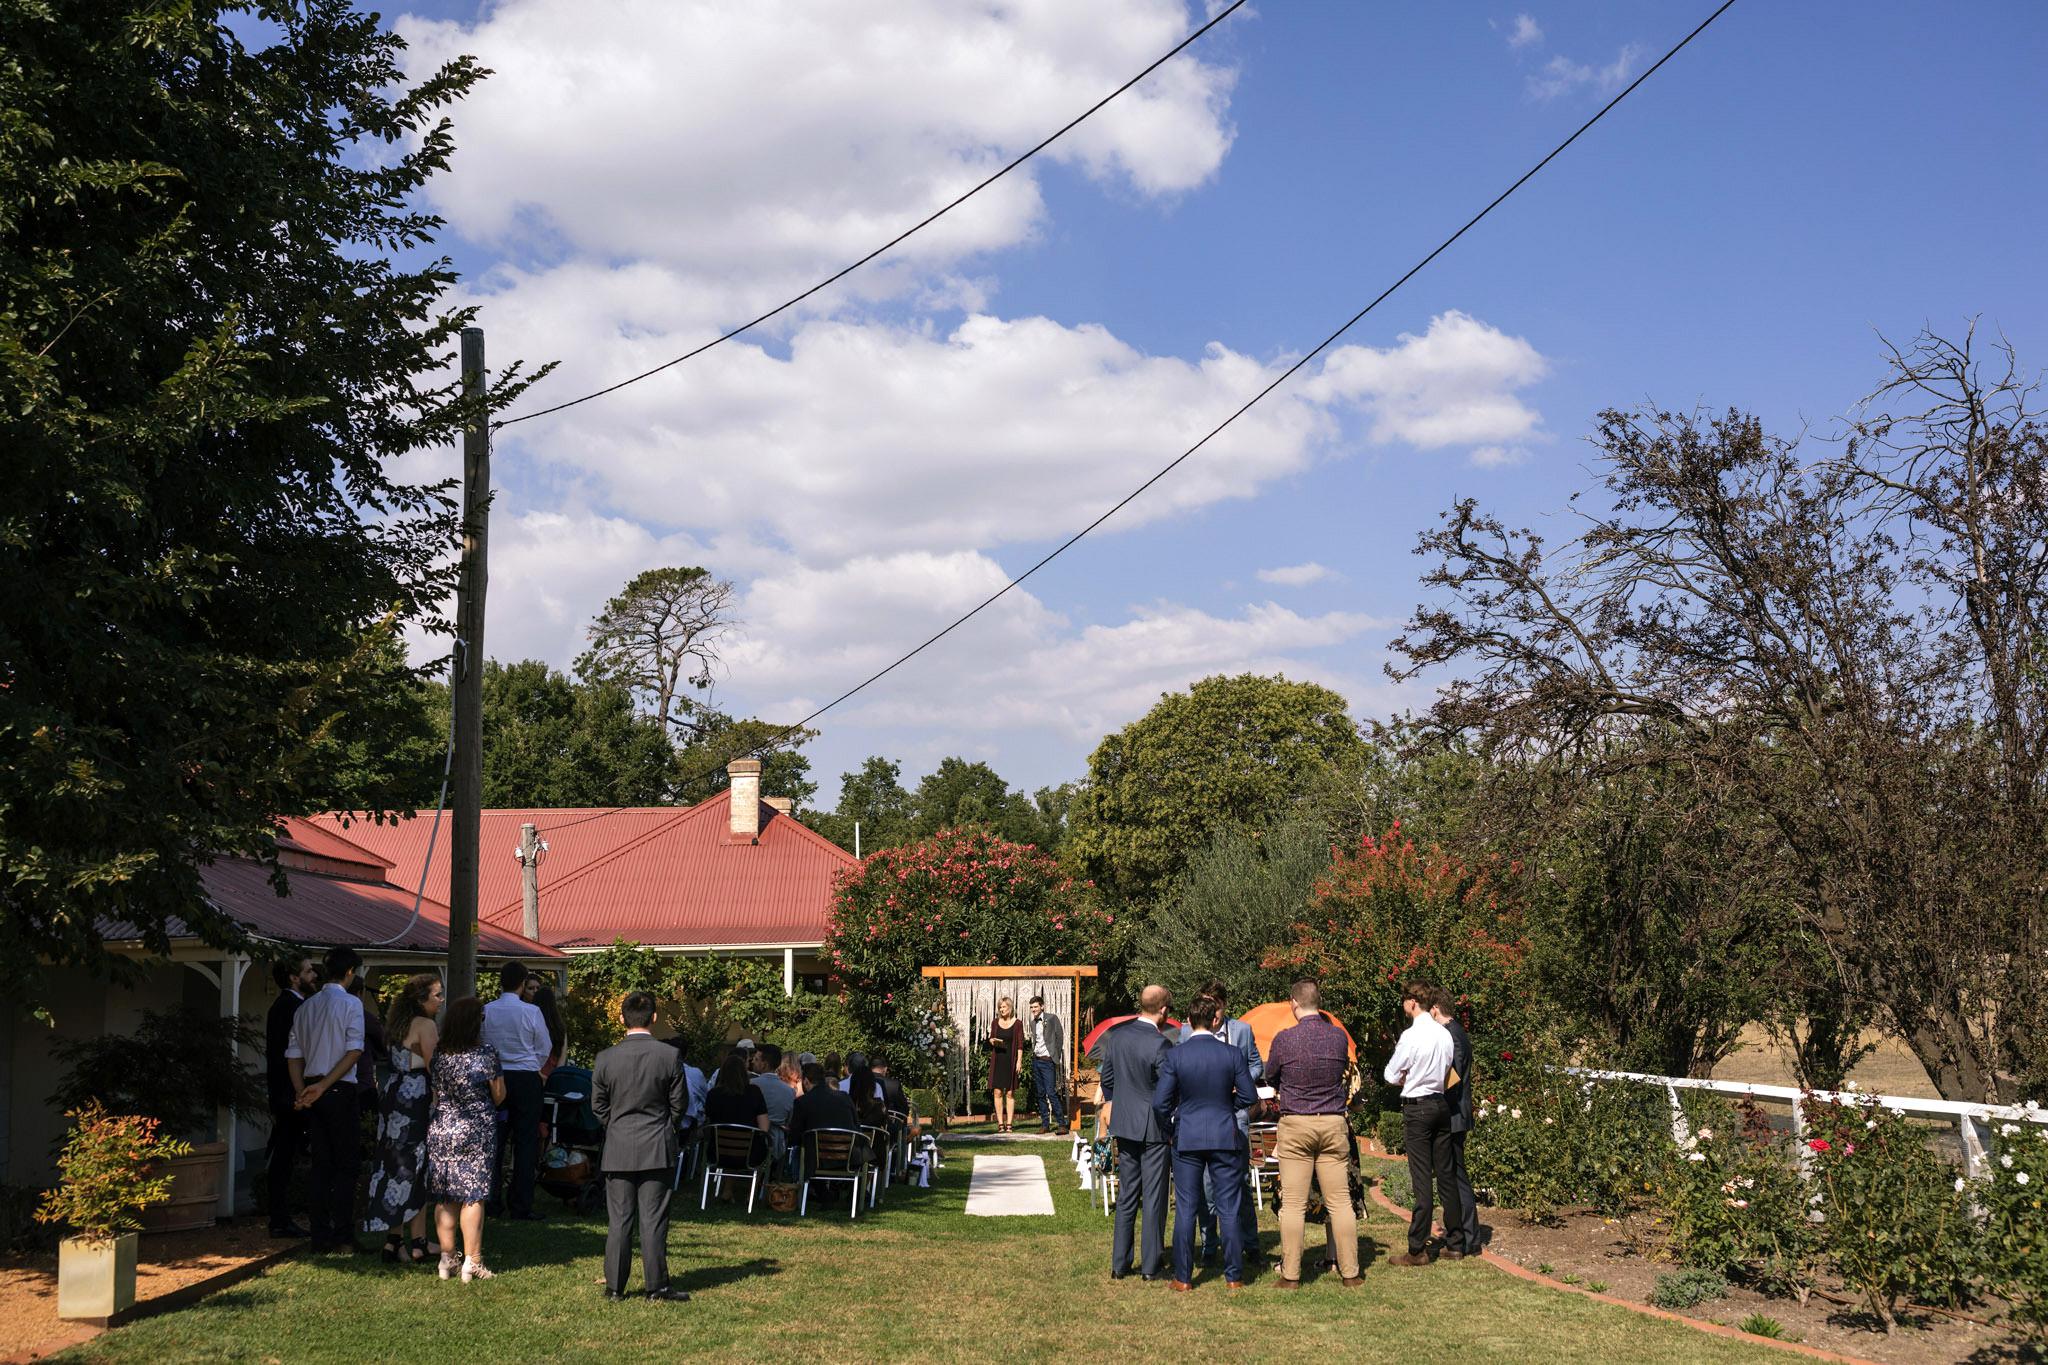 Erin_Latimore_Mudgee_Canberra_Wedding_Photographer_Tuggeranong_Homestead_126.JPG